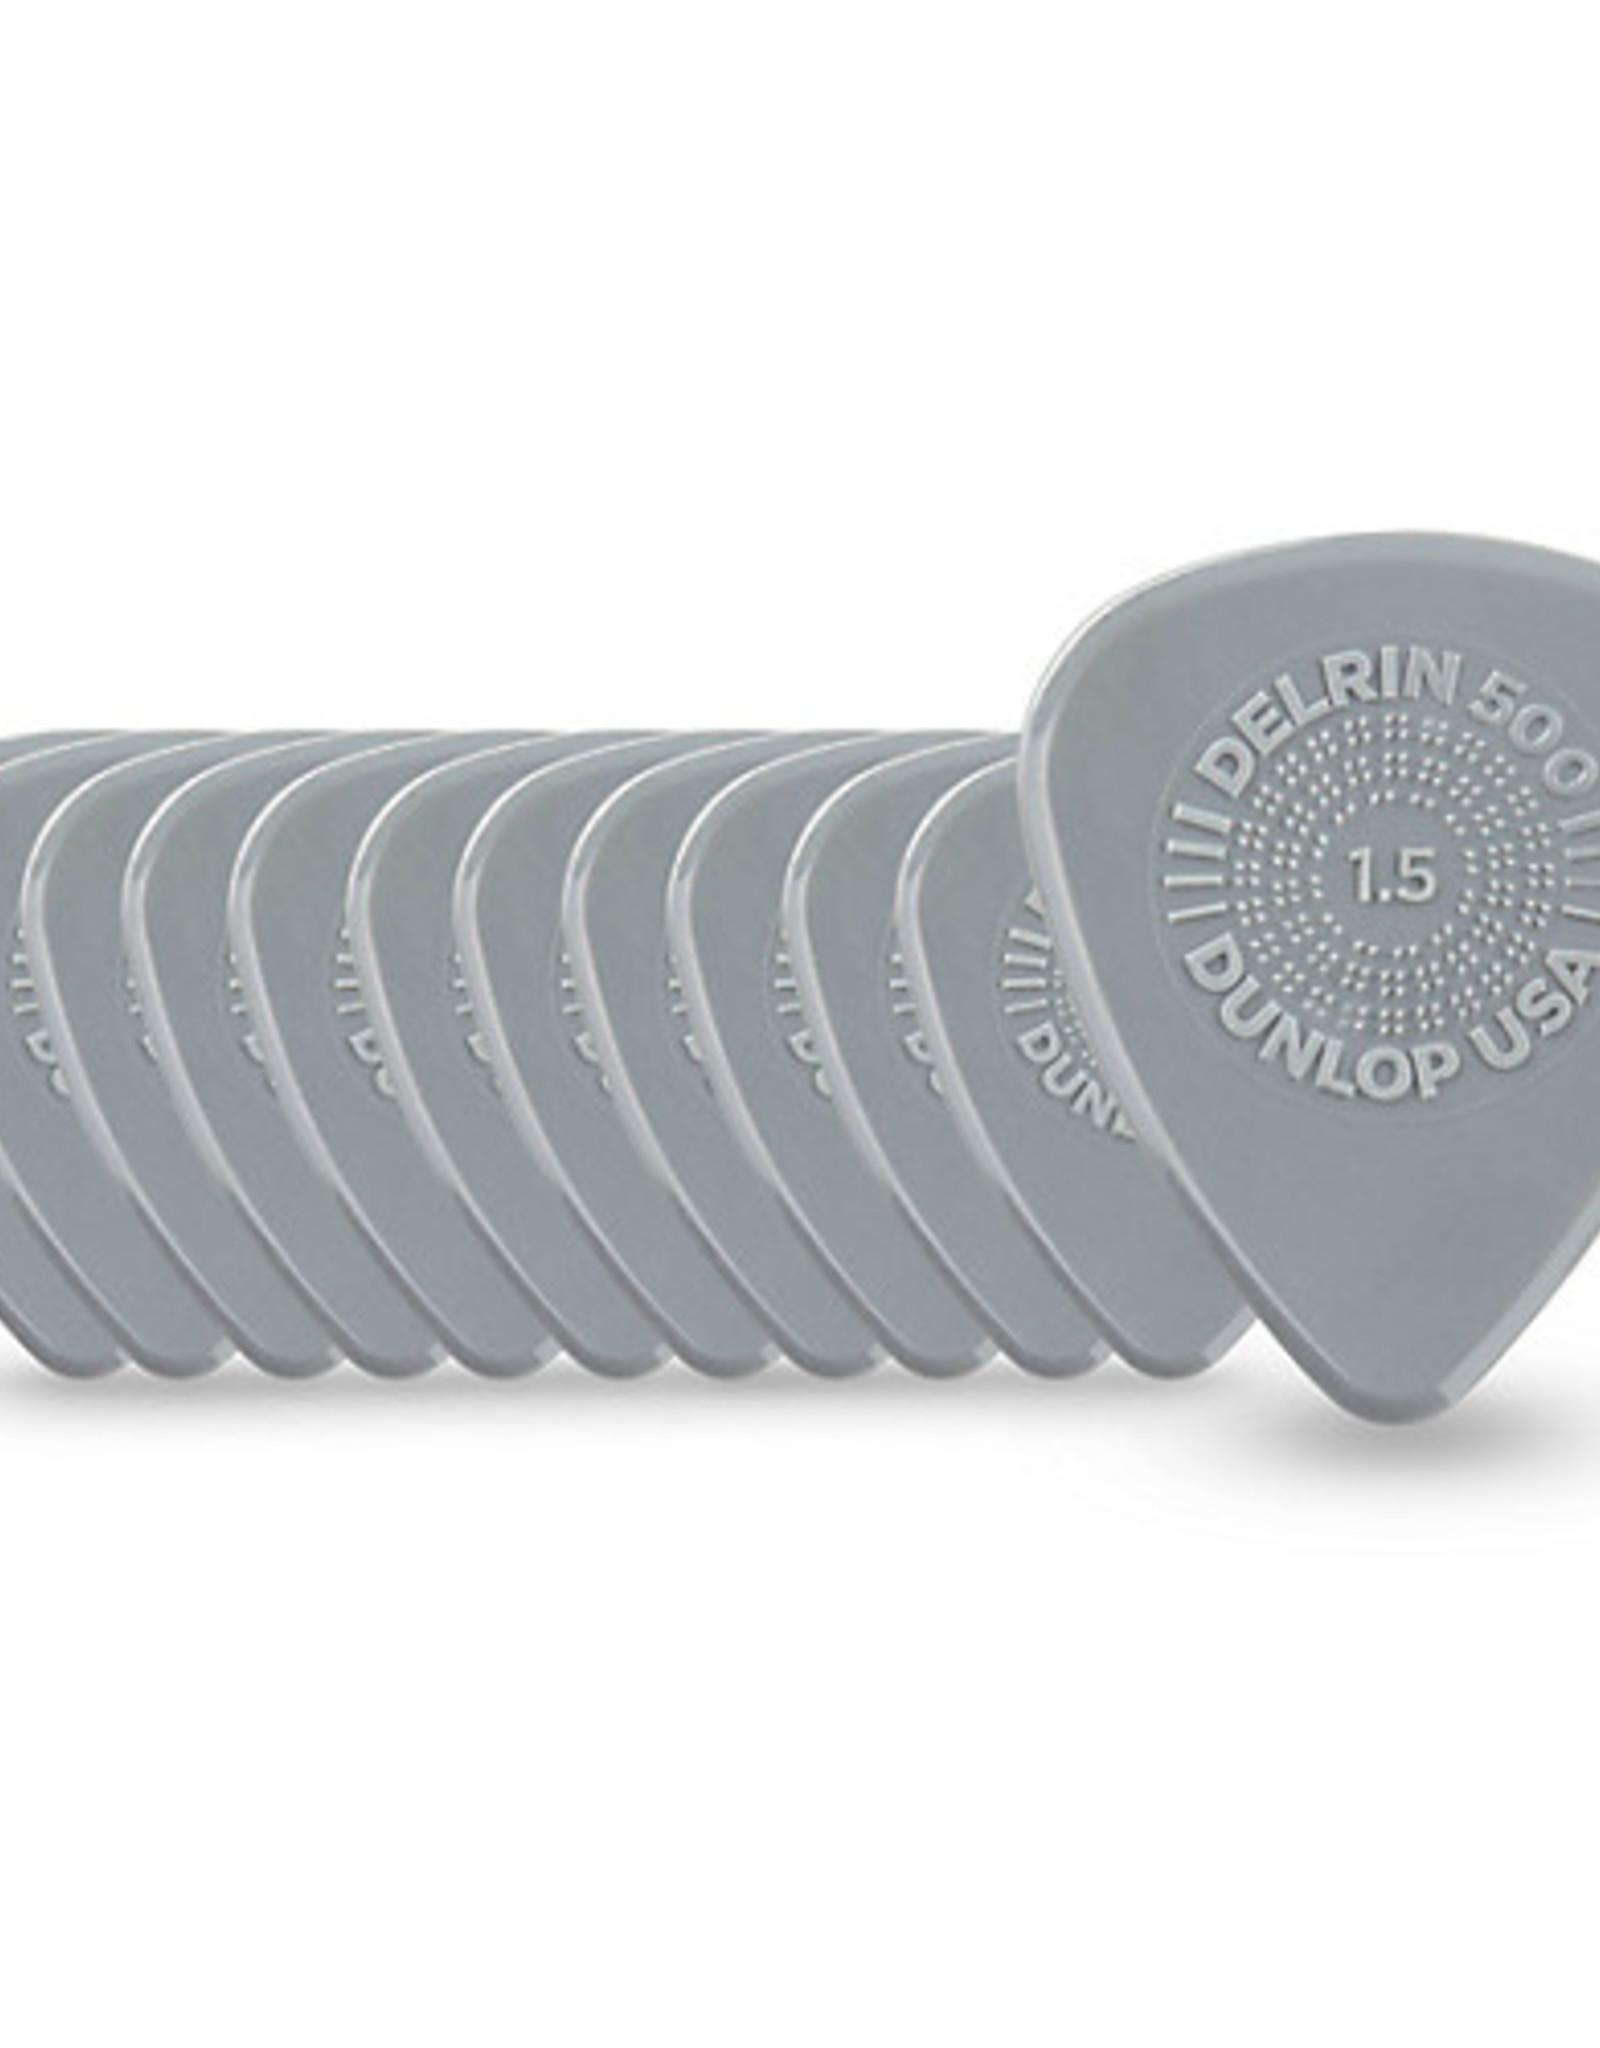 Dunlop Dunlop Prime Grip Delrin 500 12pk Picks